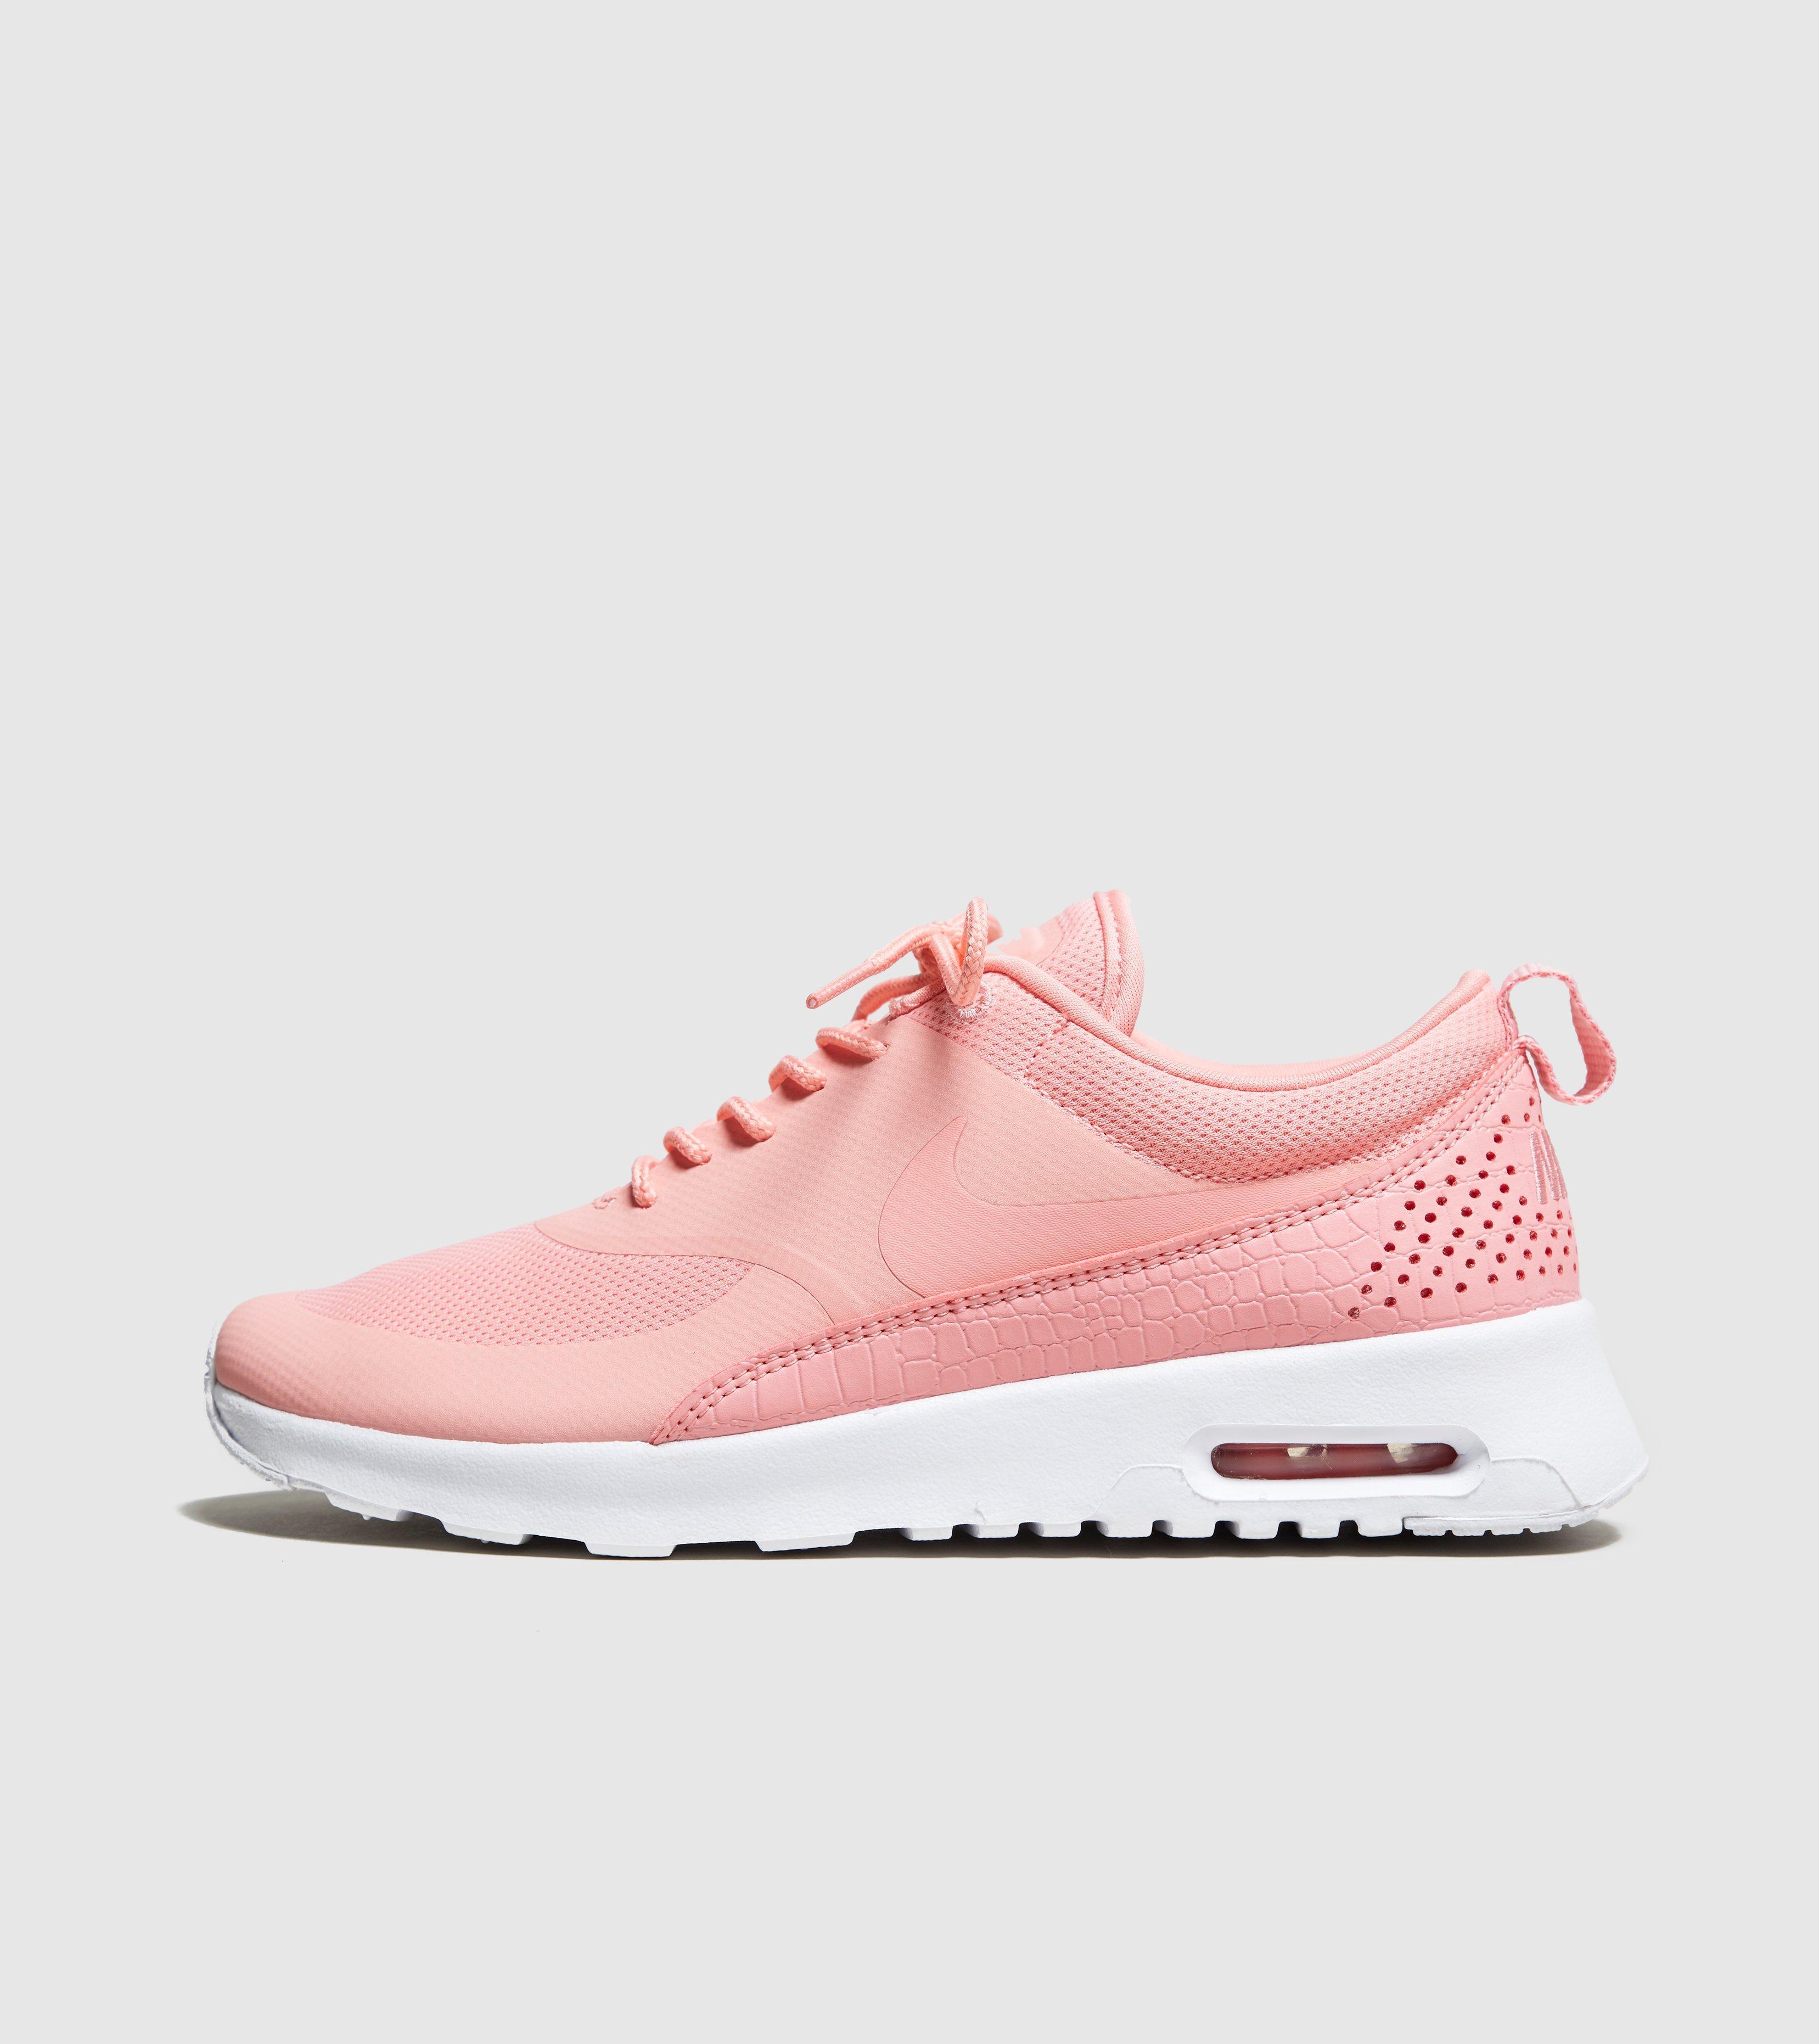 nike air max thea womens pink